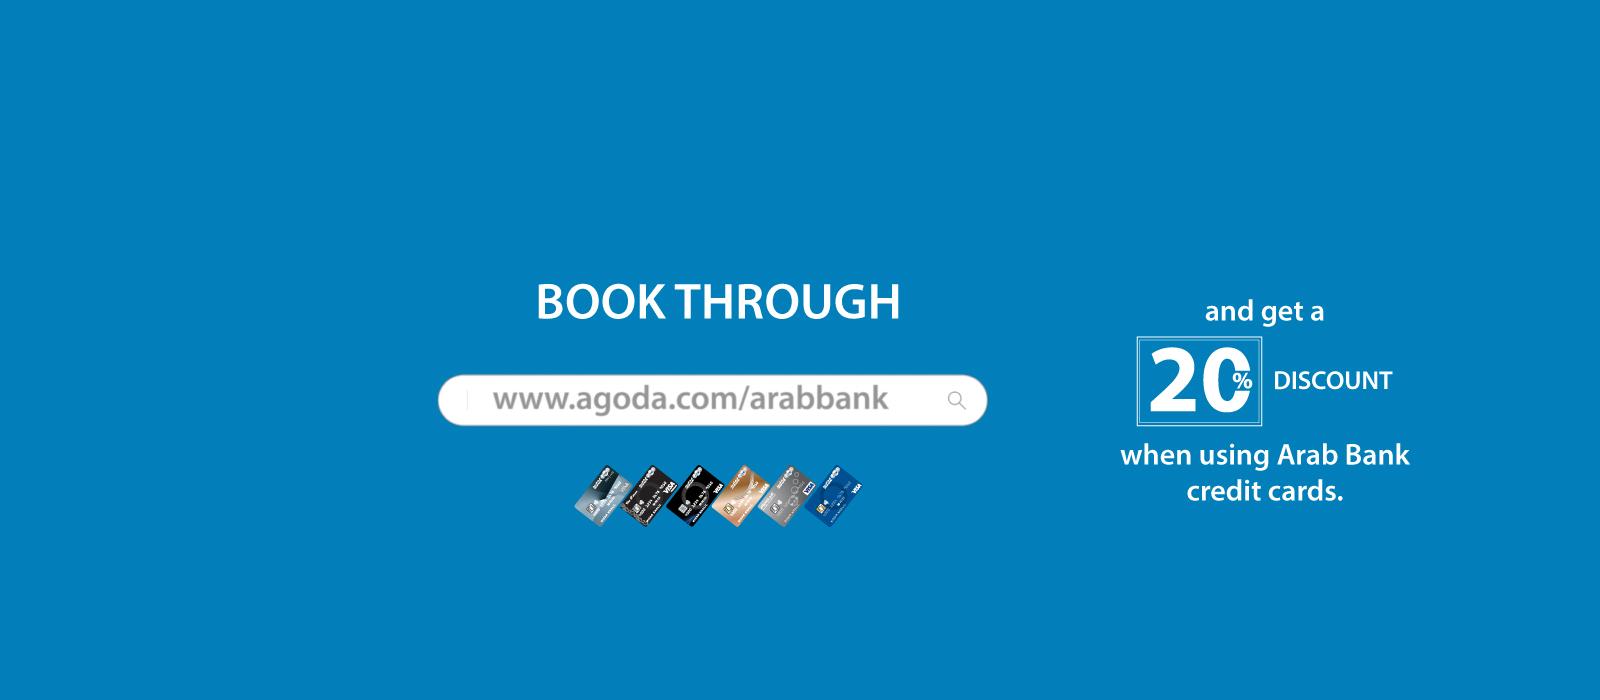 Agoda.com--Website-banners-ENG